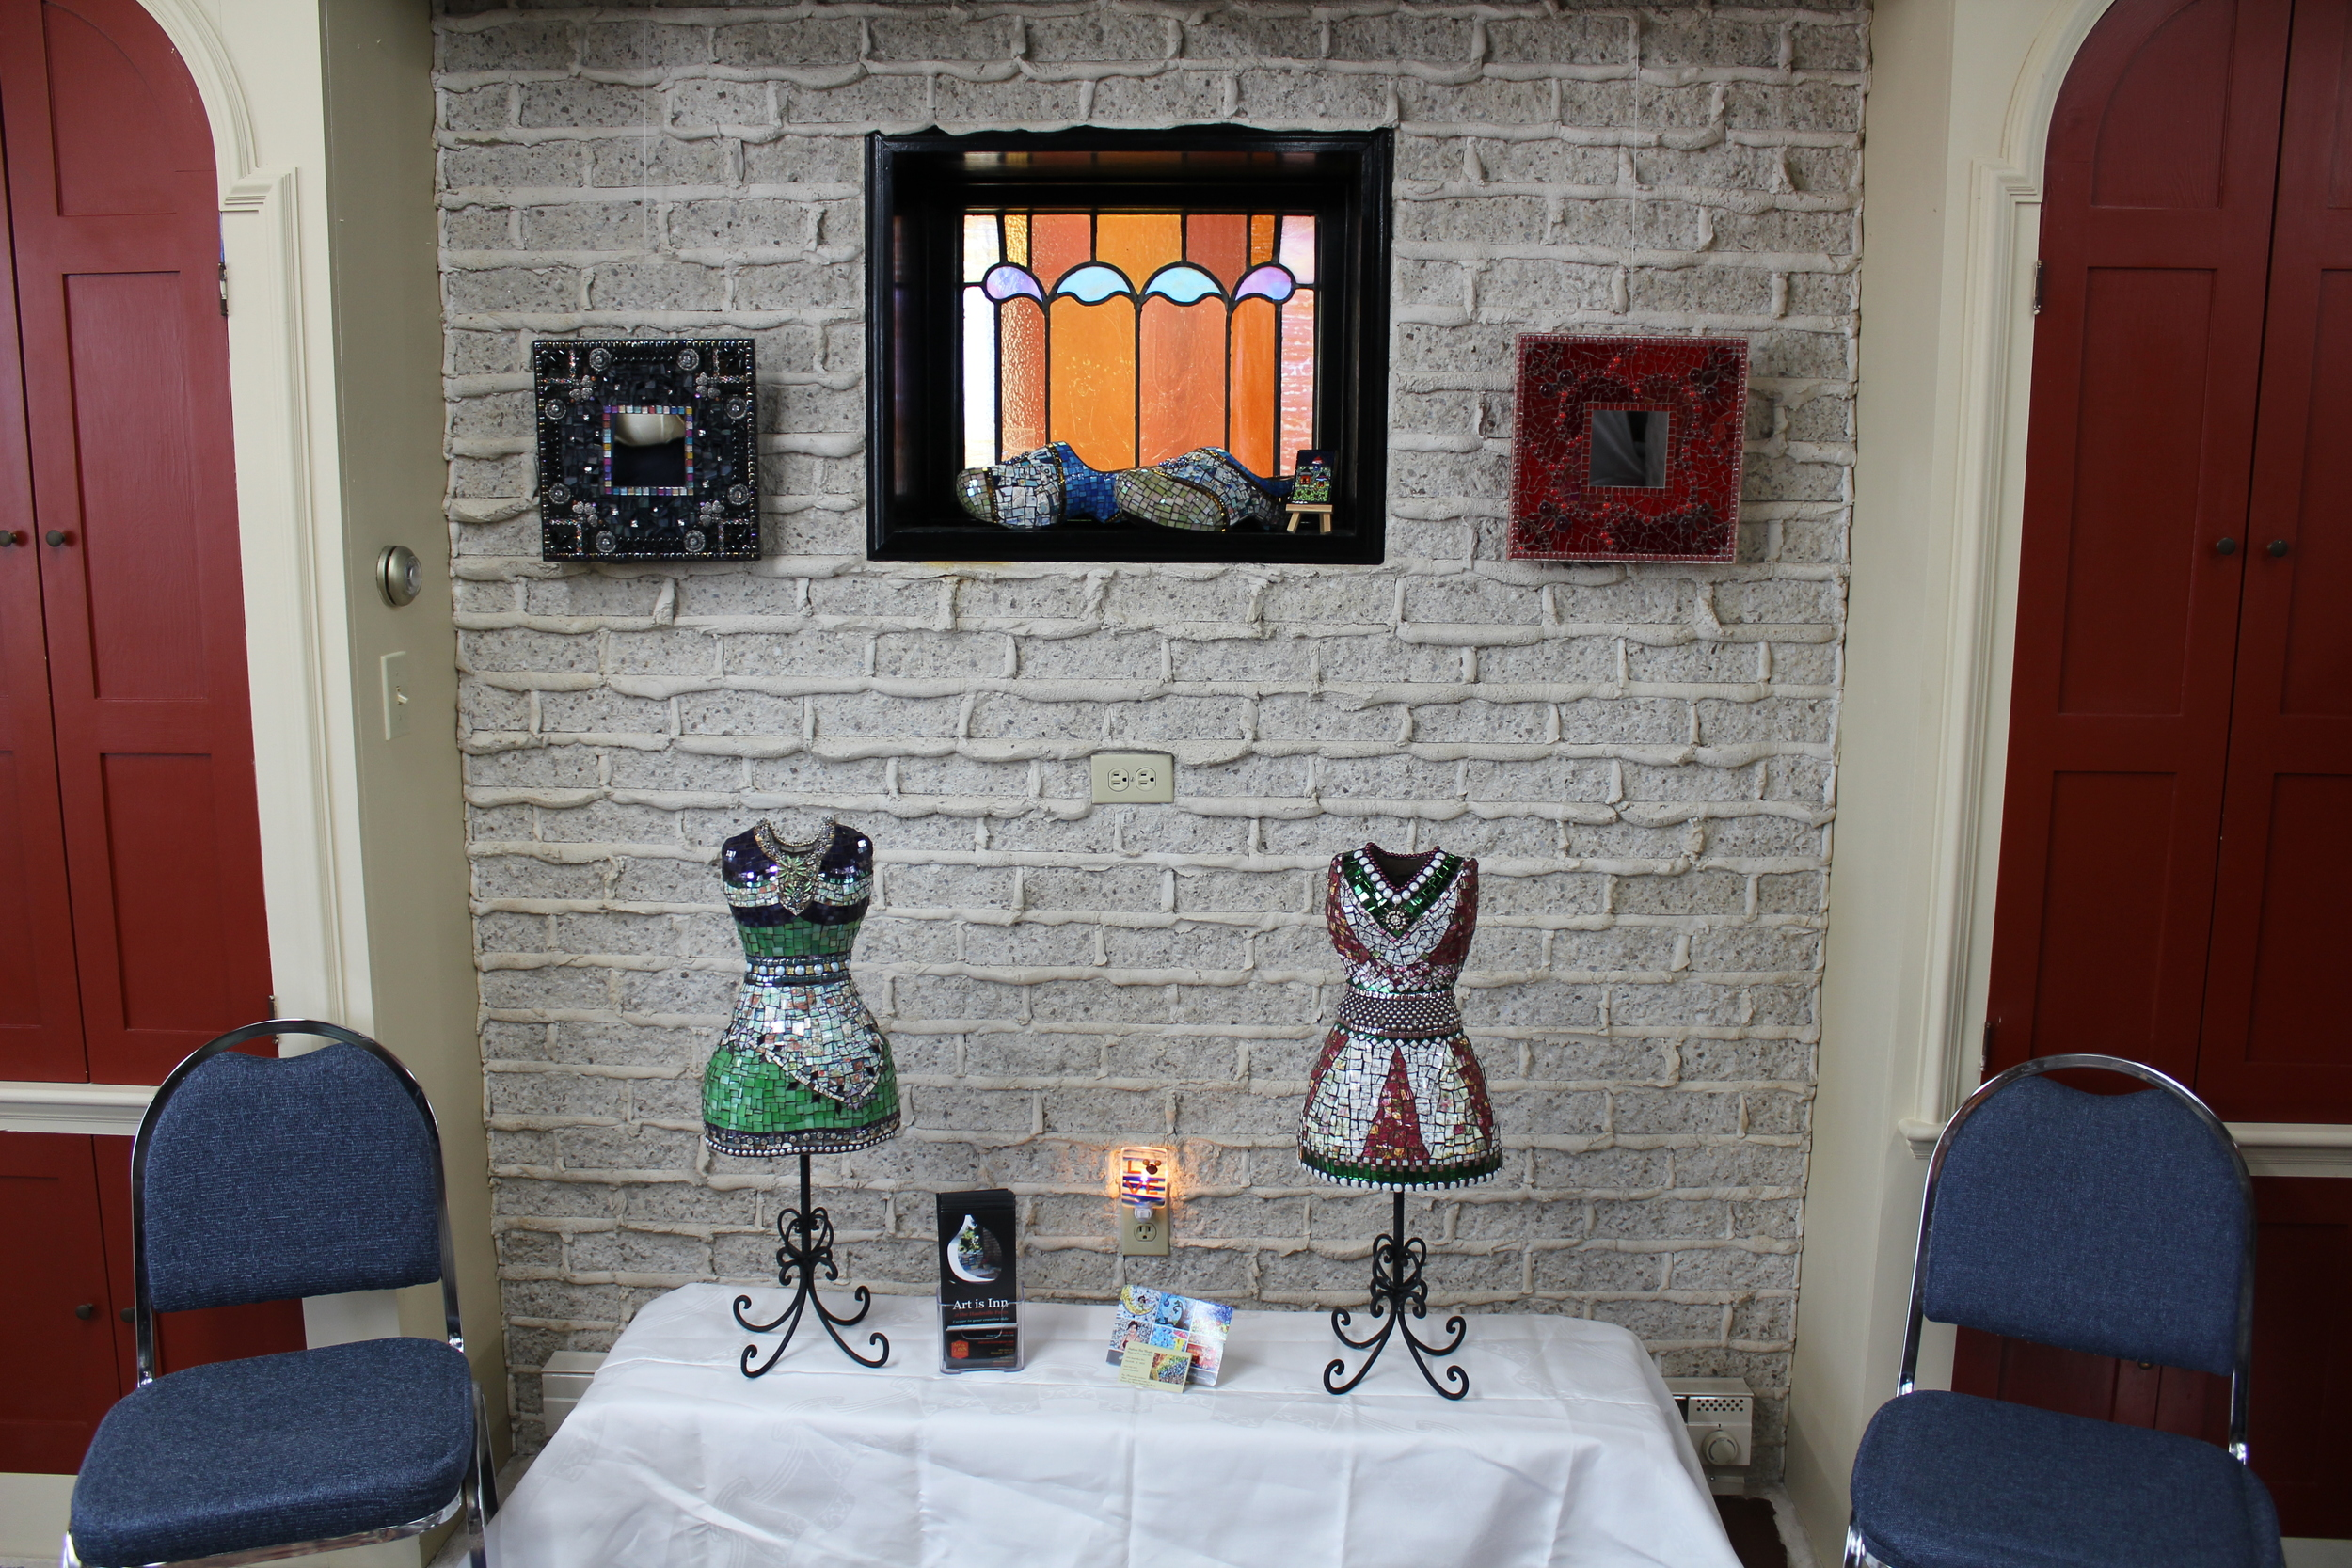 Mosaic dresses. Mirrors and Sprenkelende Klompen.